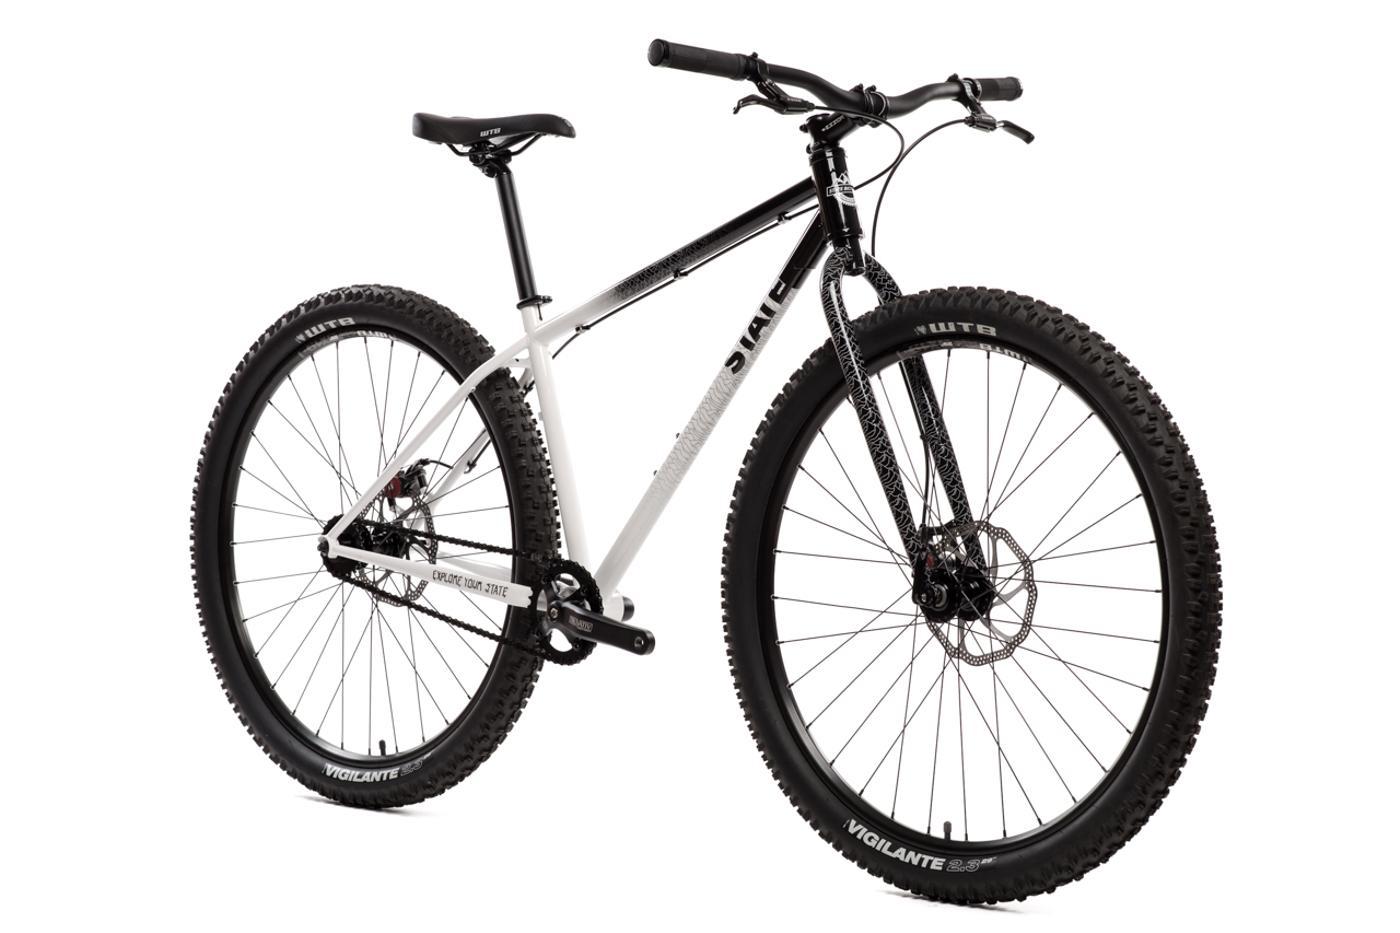 State_Bicycle_Co_29er_Single_Speed_MTB_STD_25